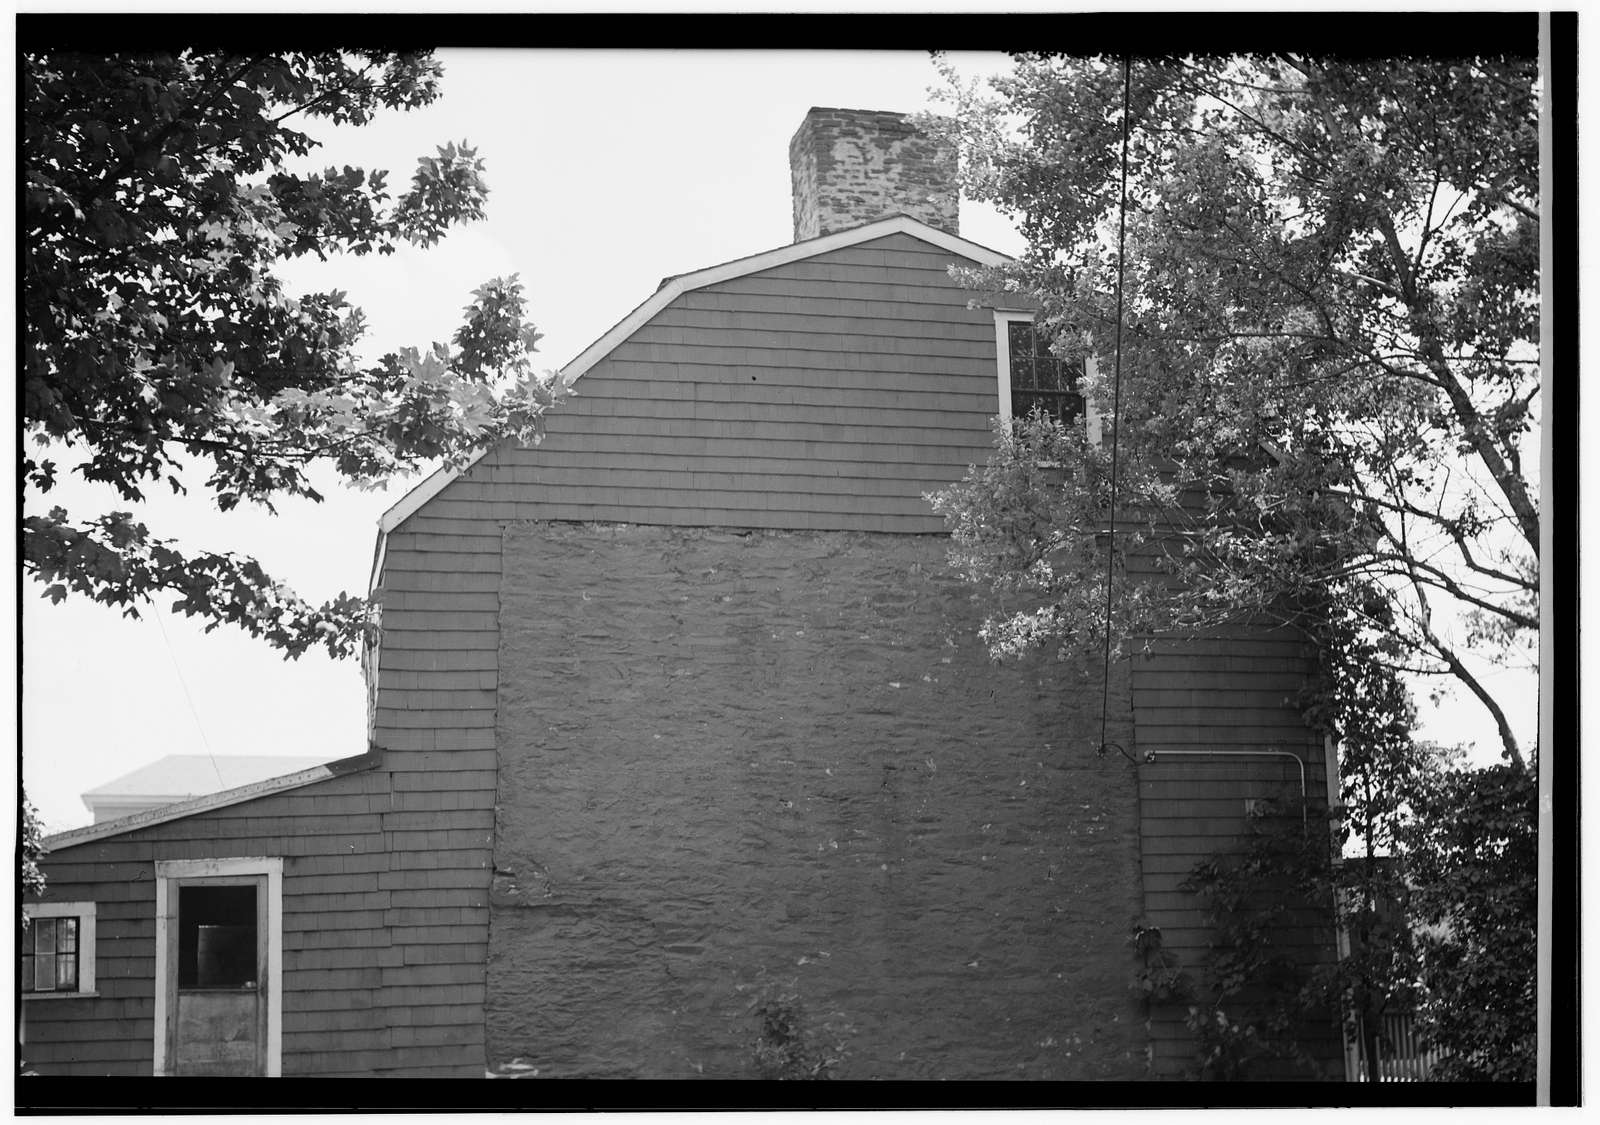 Elder John Bliss House, 2 Wilbur Avenue, Newport, Newport County, RI